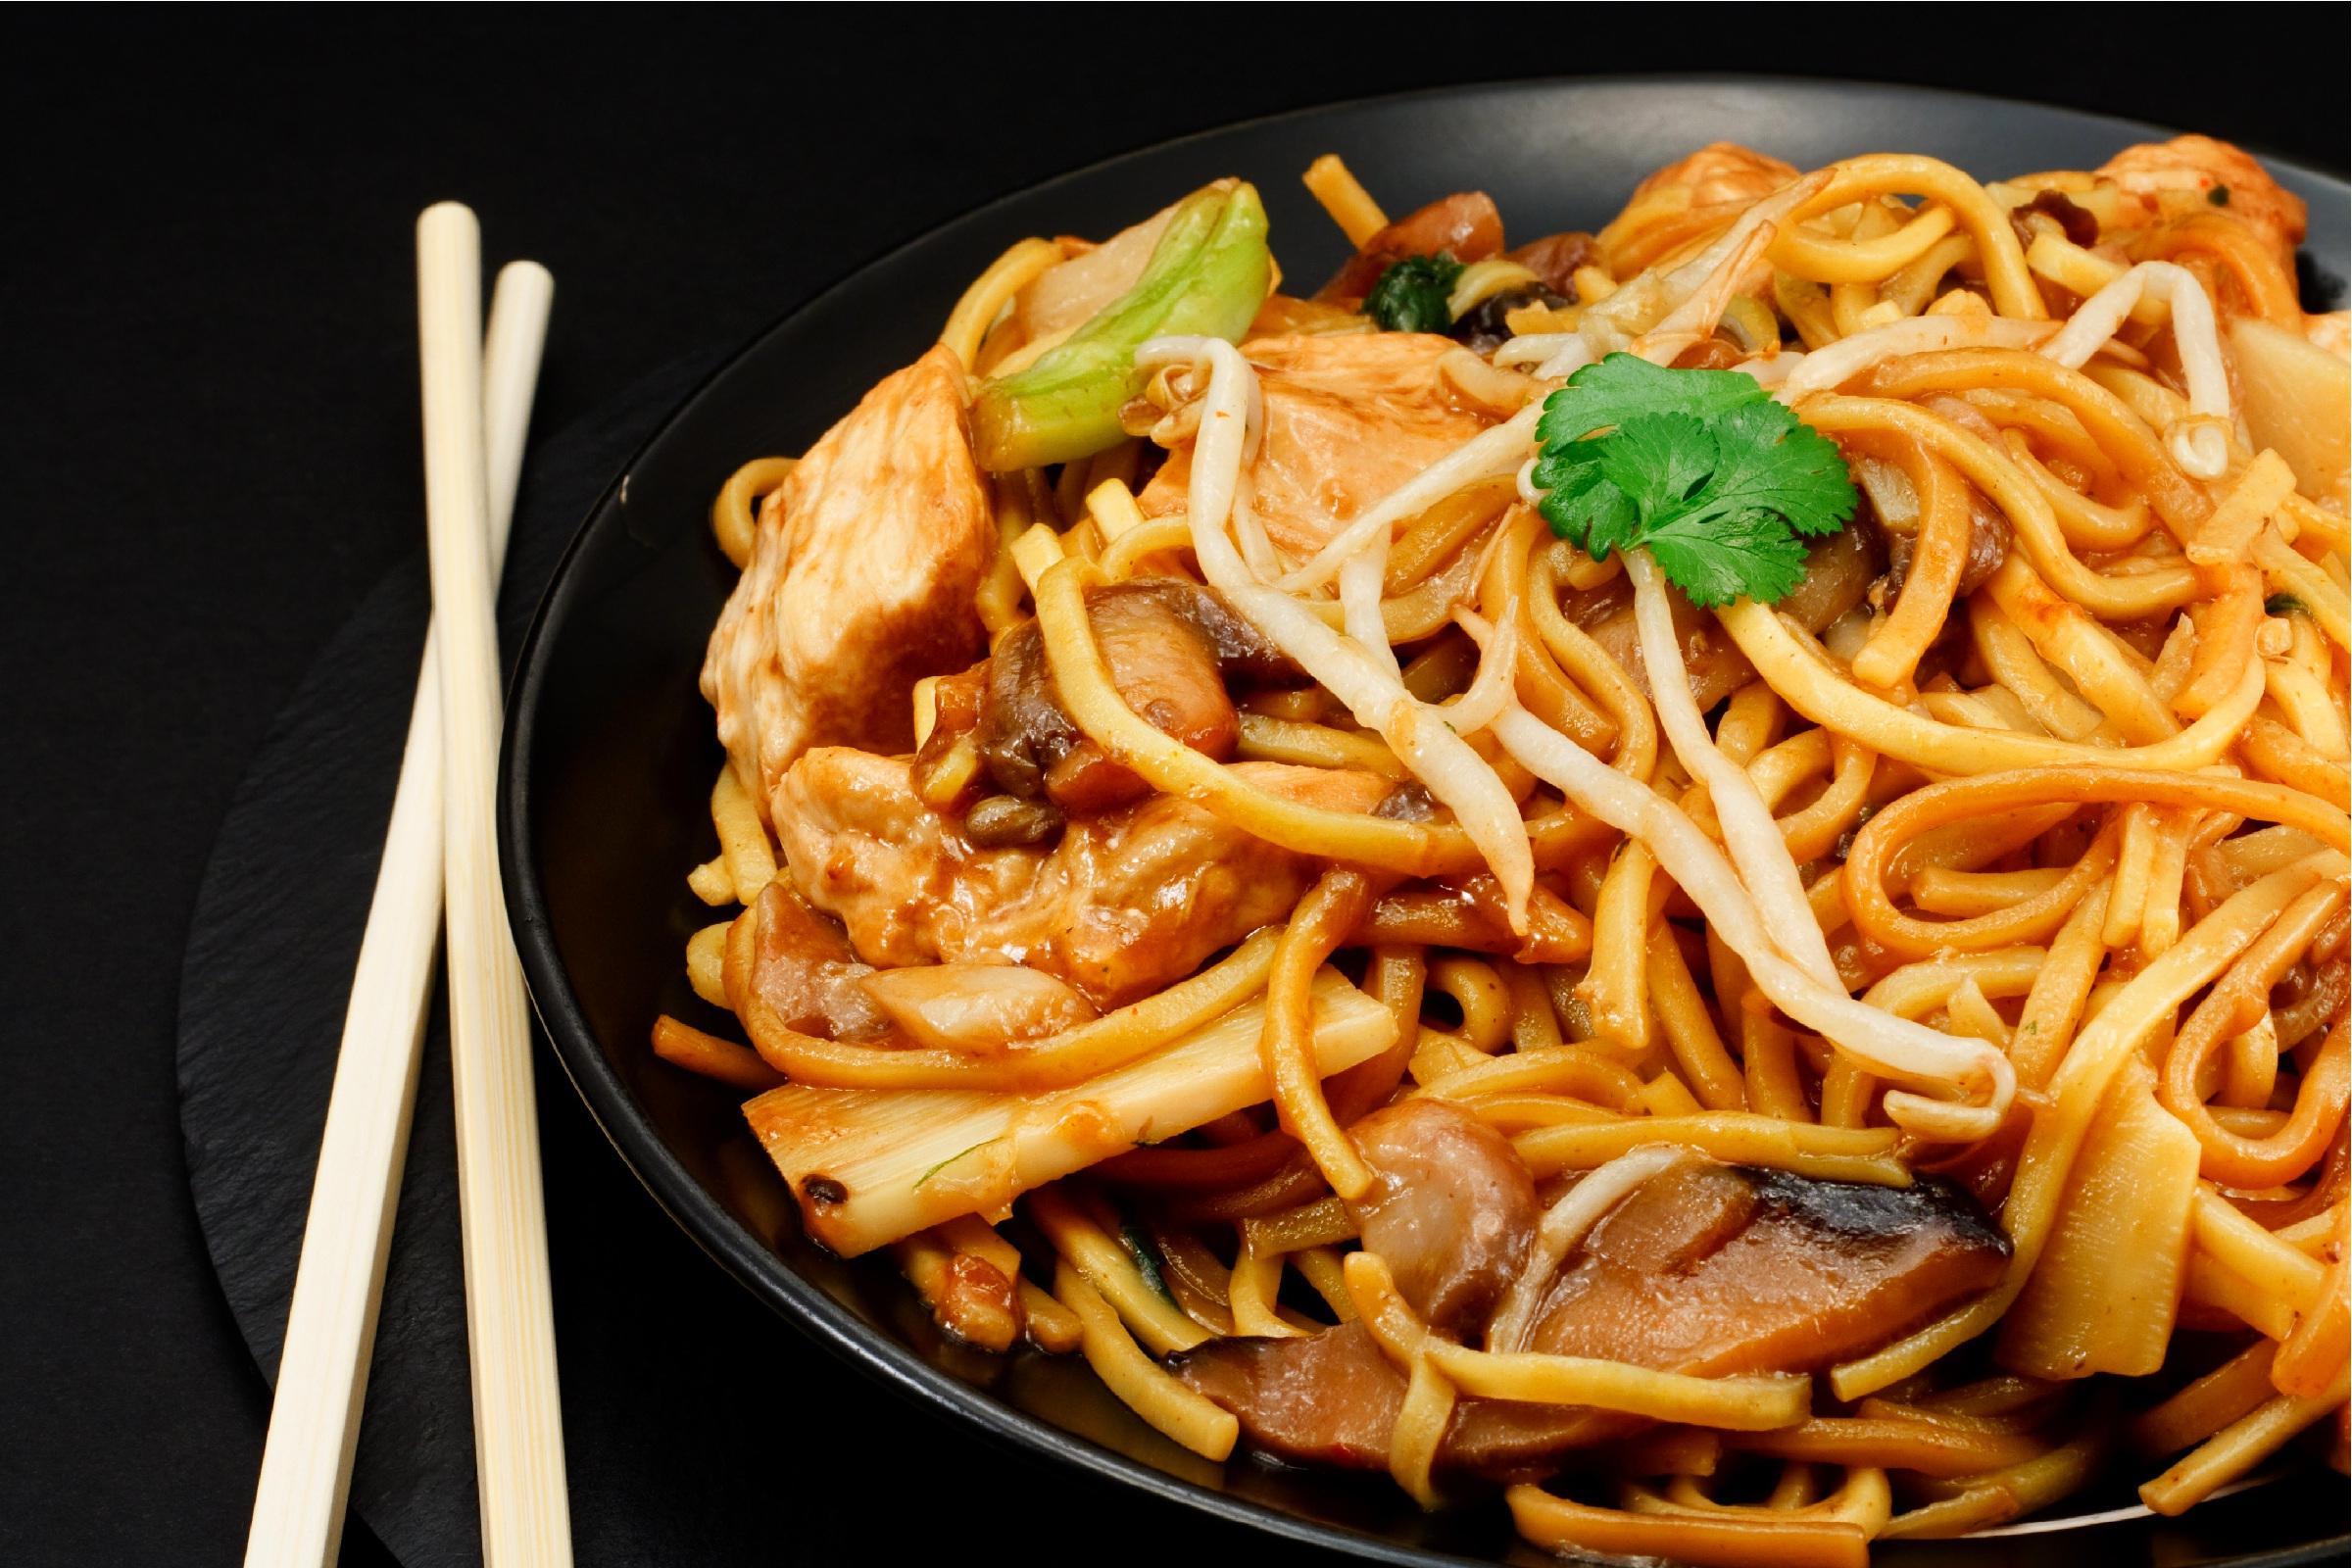 Nourriture chinoise pendant la grossesse